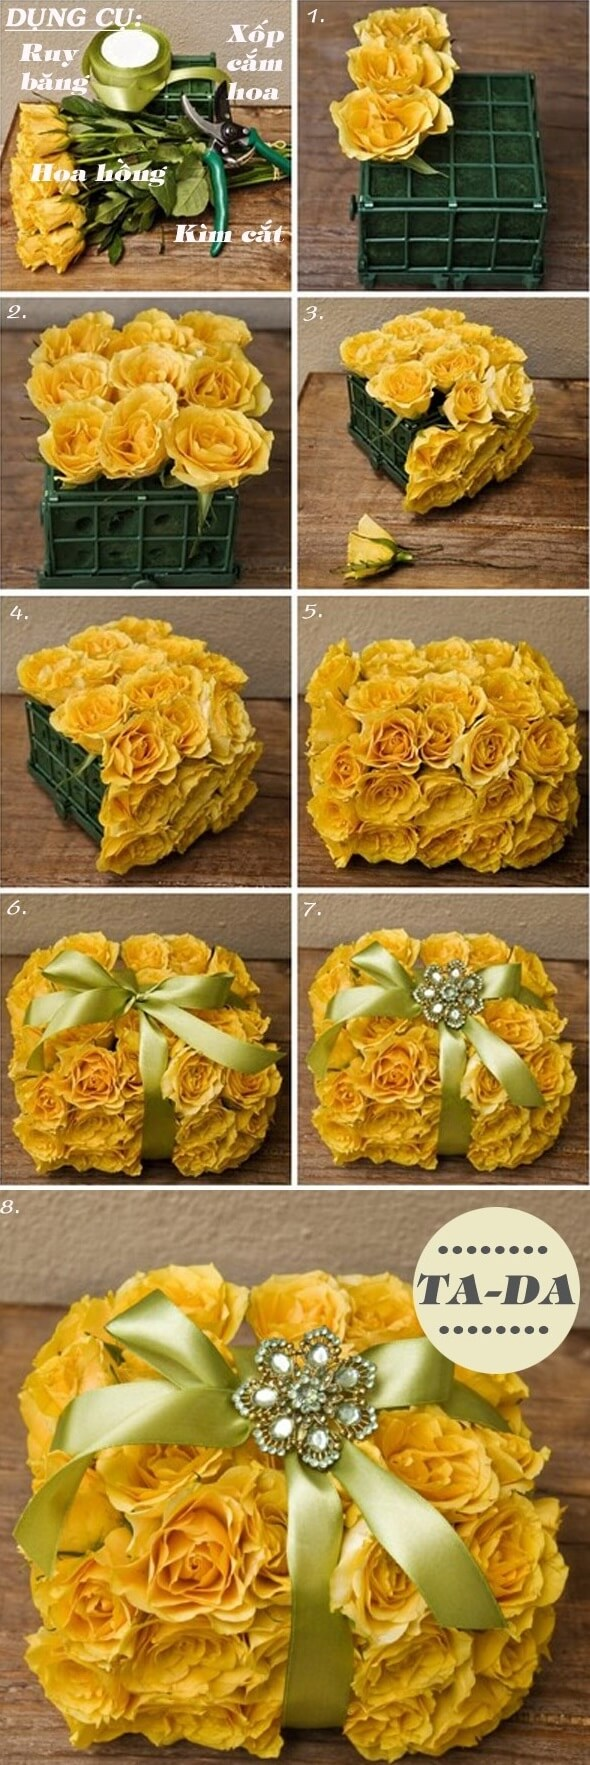 cách cắm hoa ngày 20-10